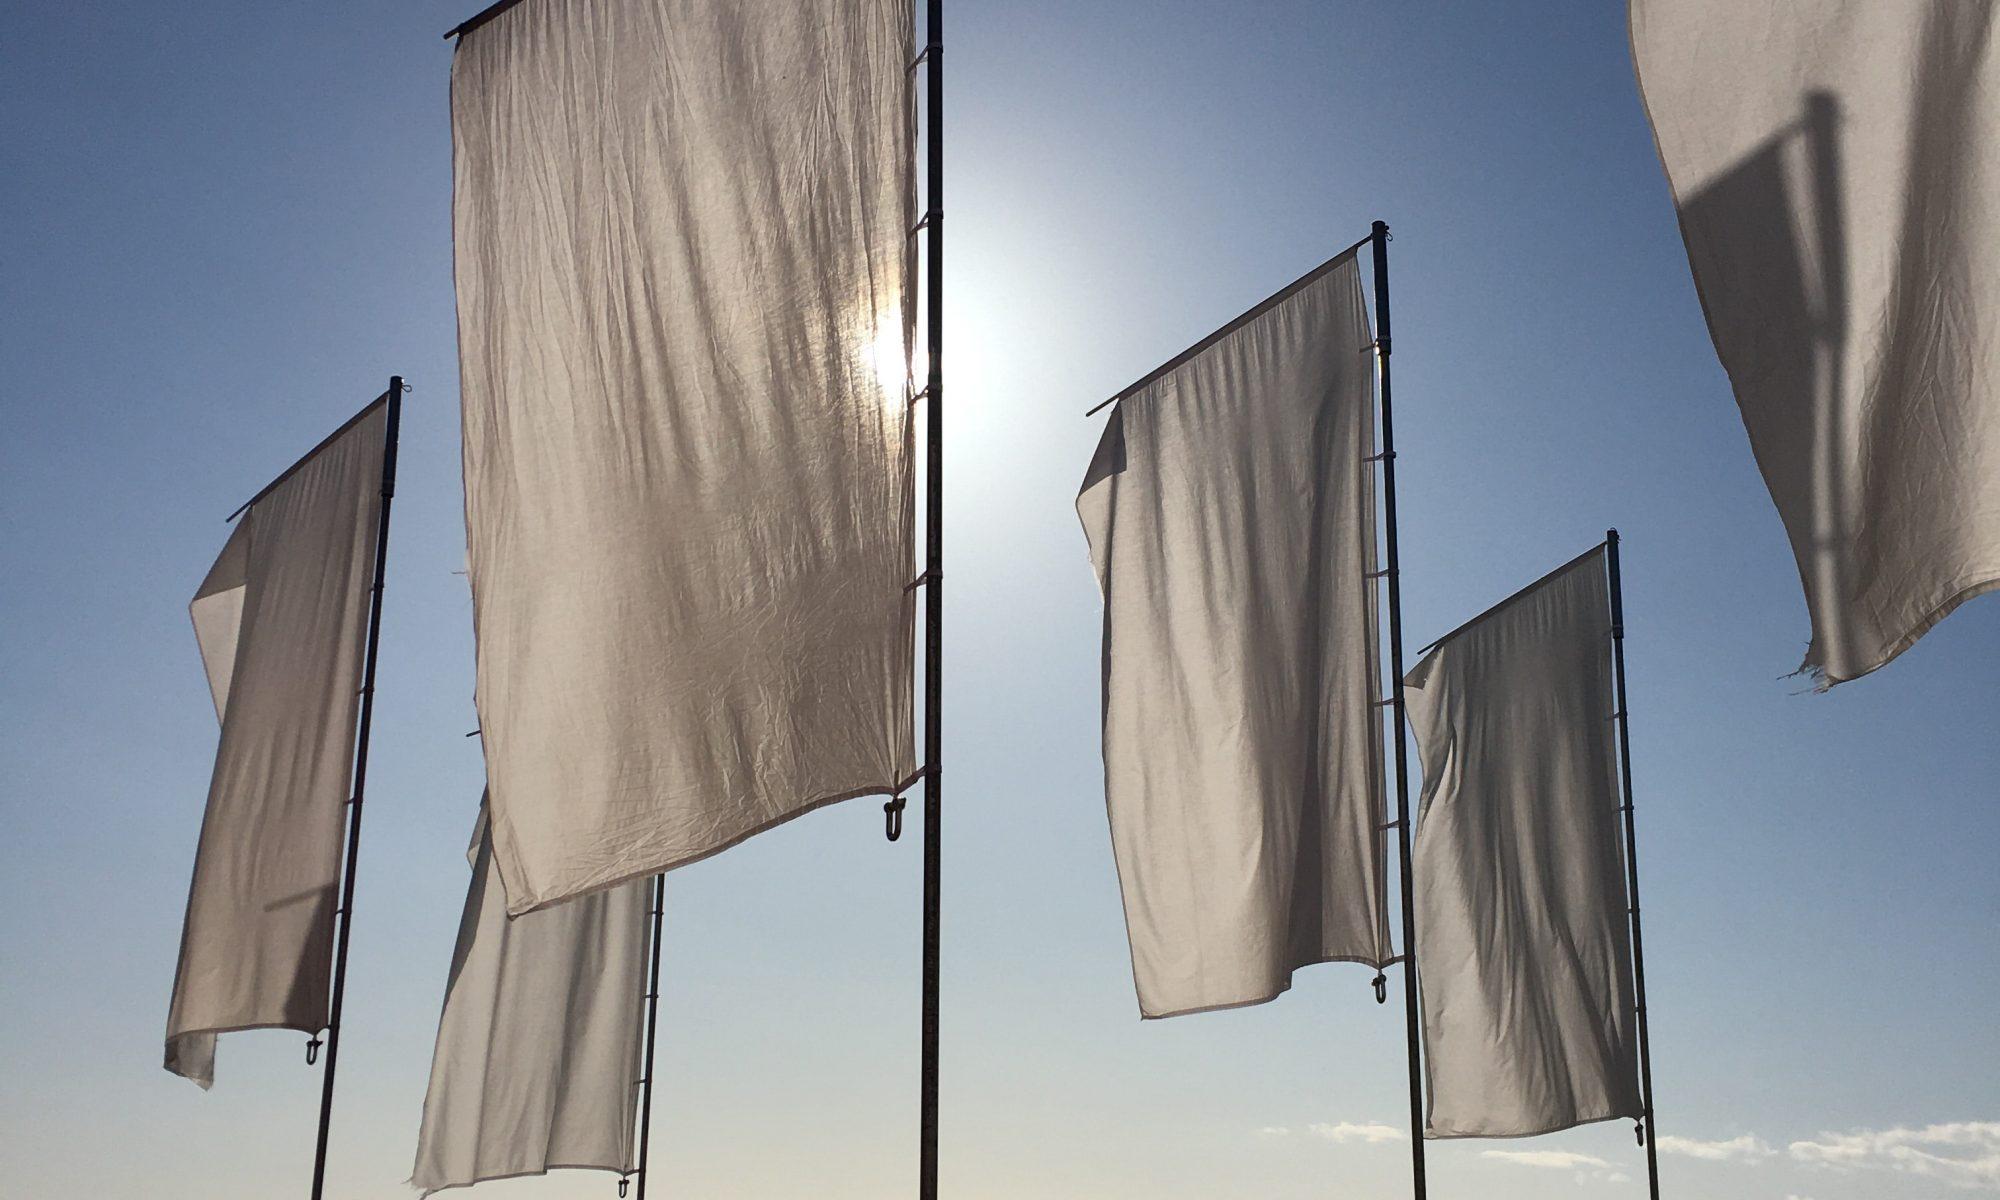 beachflag design